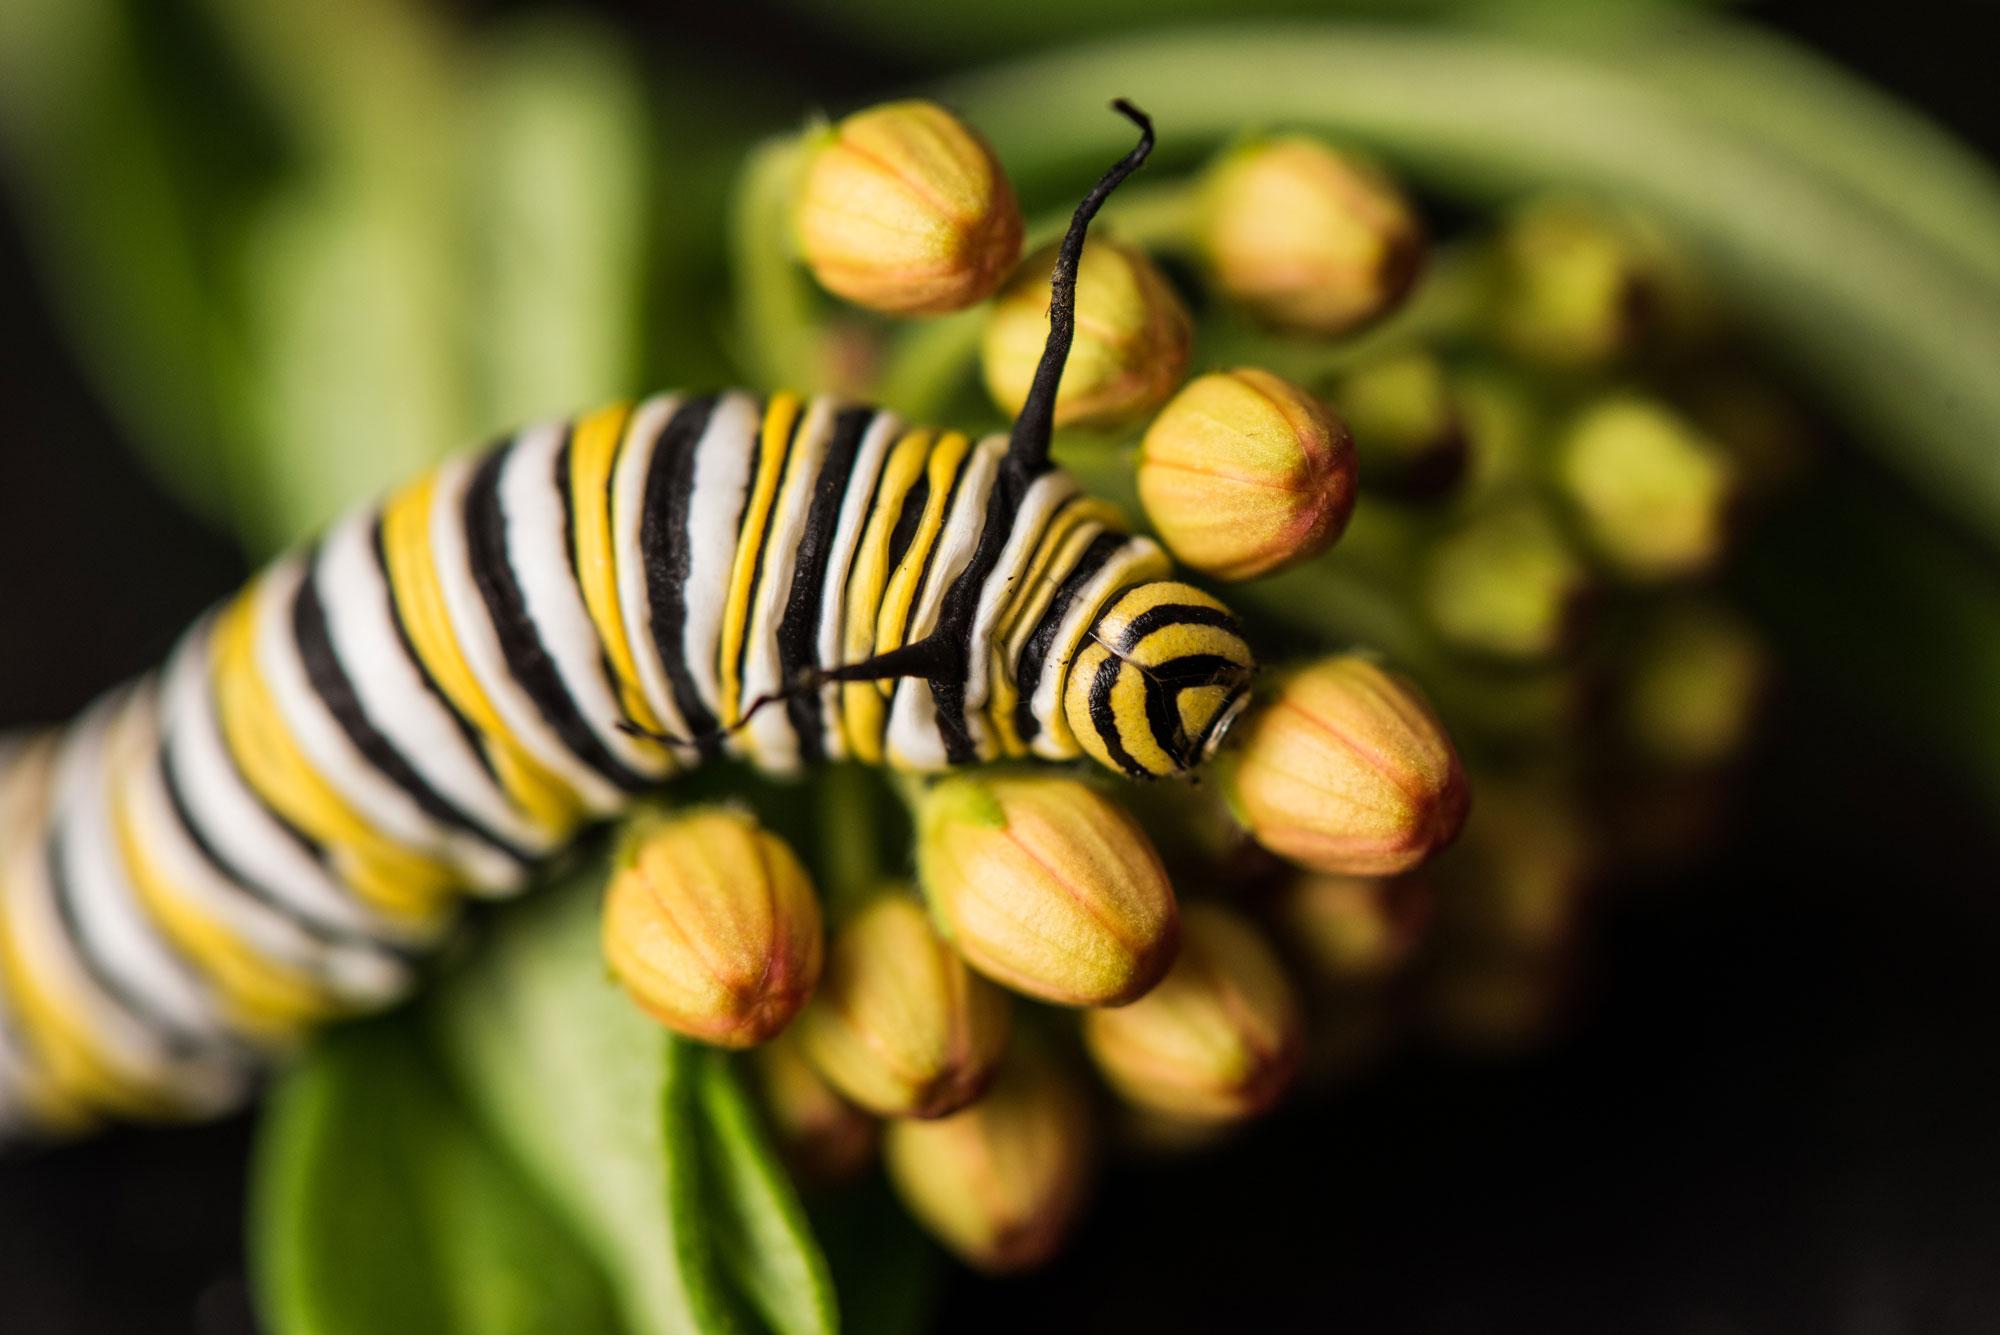 Monarch caterpillar on a milkweed plant. Image credit: Austin Thomason/Michigan Photography